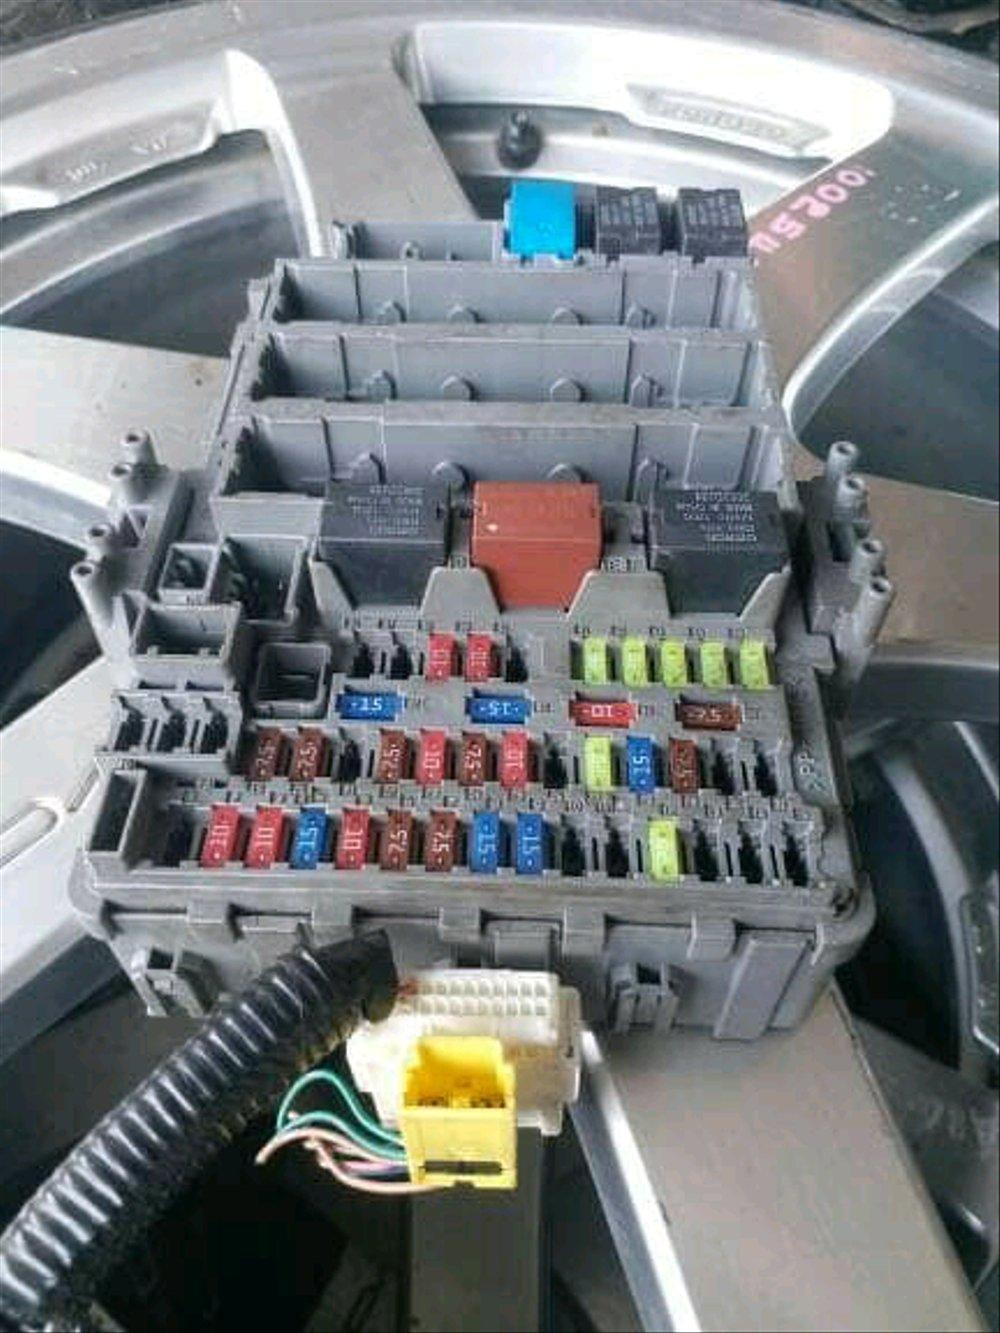 hight resolution of honda crv 2013 box sikring dalam micu etac fuse box toa